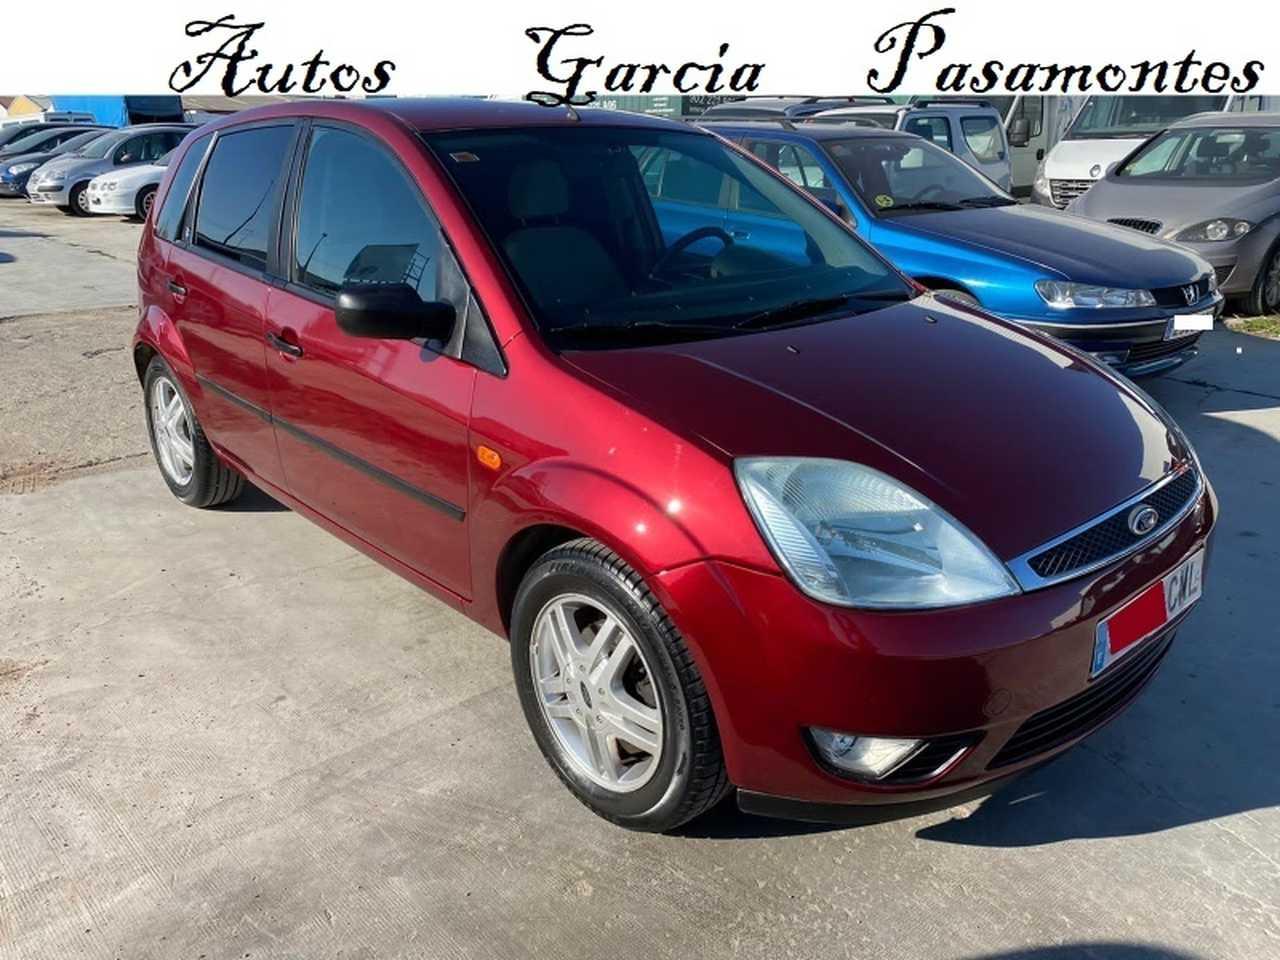 Ford Fiesta 1.4 TDCI   70 CV  1 AÑO DE GARANTIA  - Foto 1